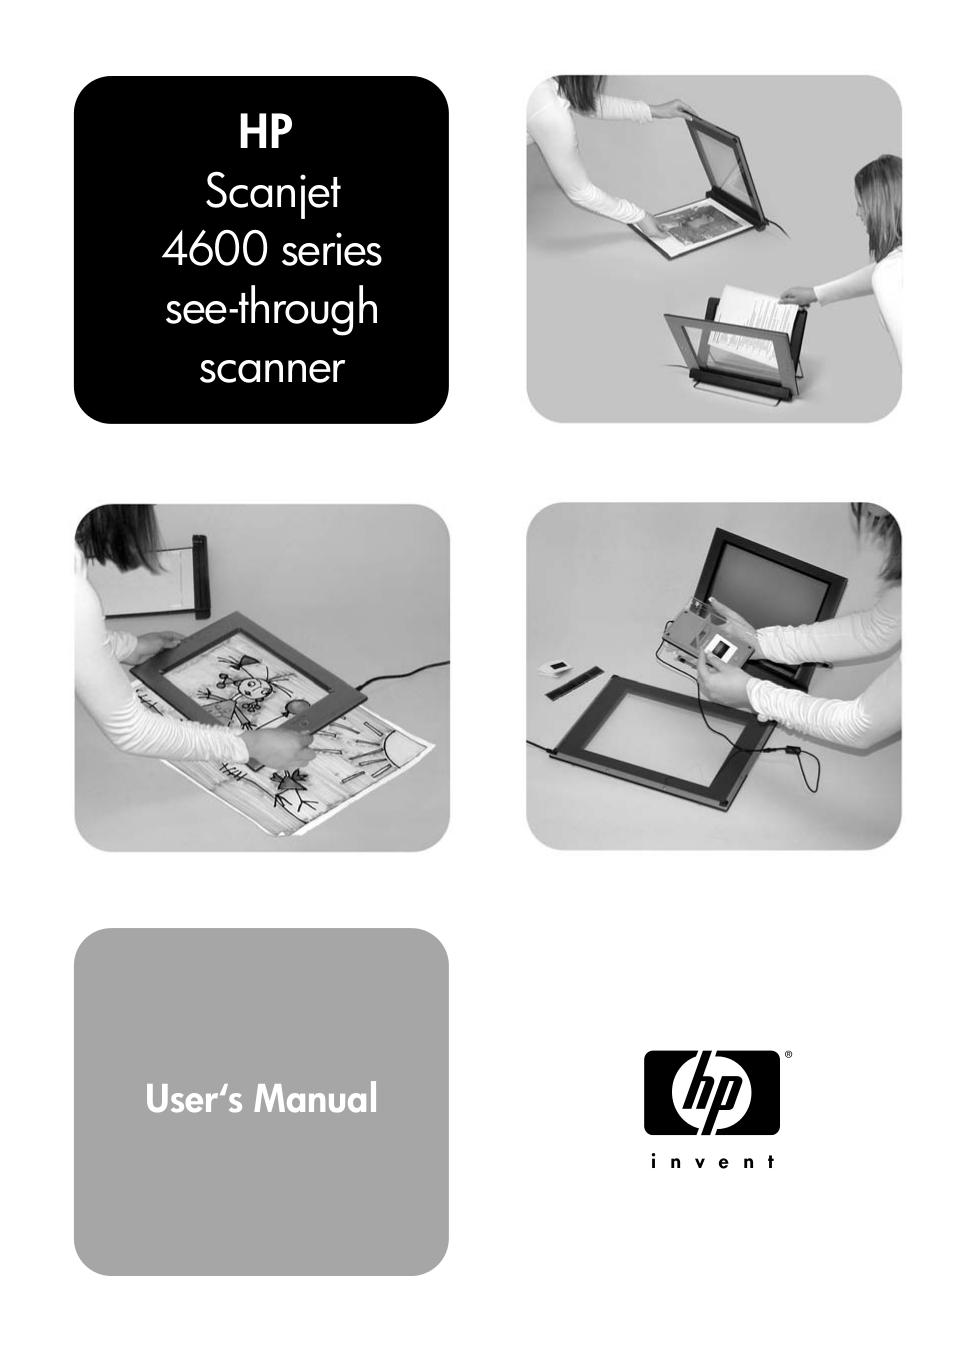 Hp (hewlett packard) scanjet 4600 (4000) drivers download update.